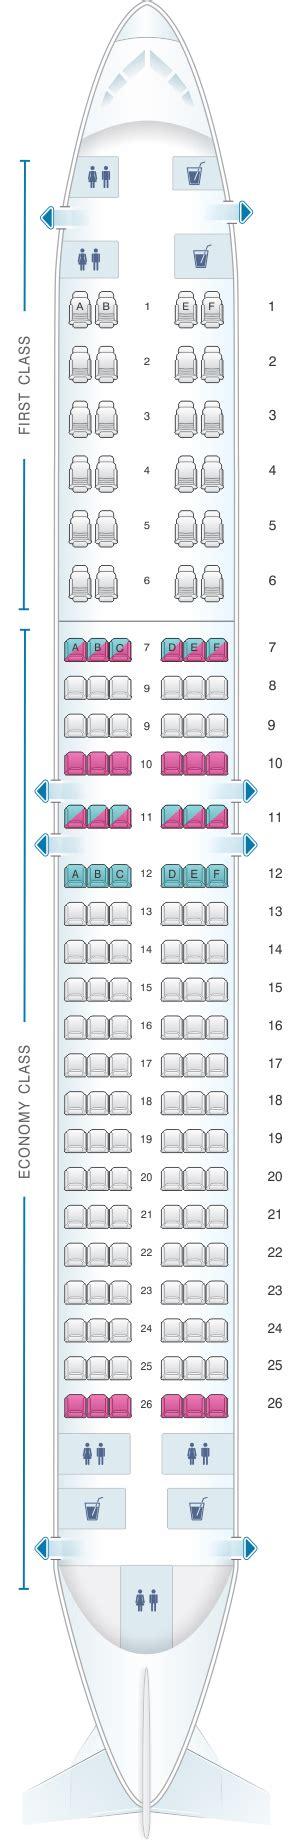 siege transavia plan de cabine air algerie boeing b737 800 config 2